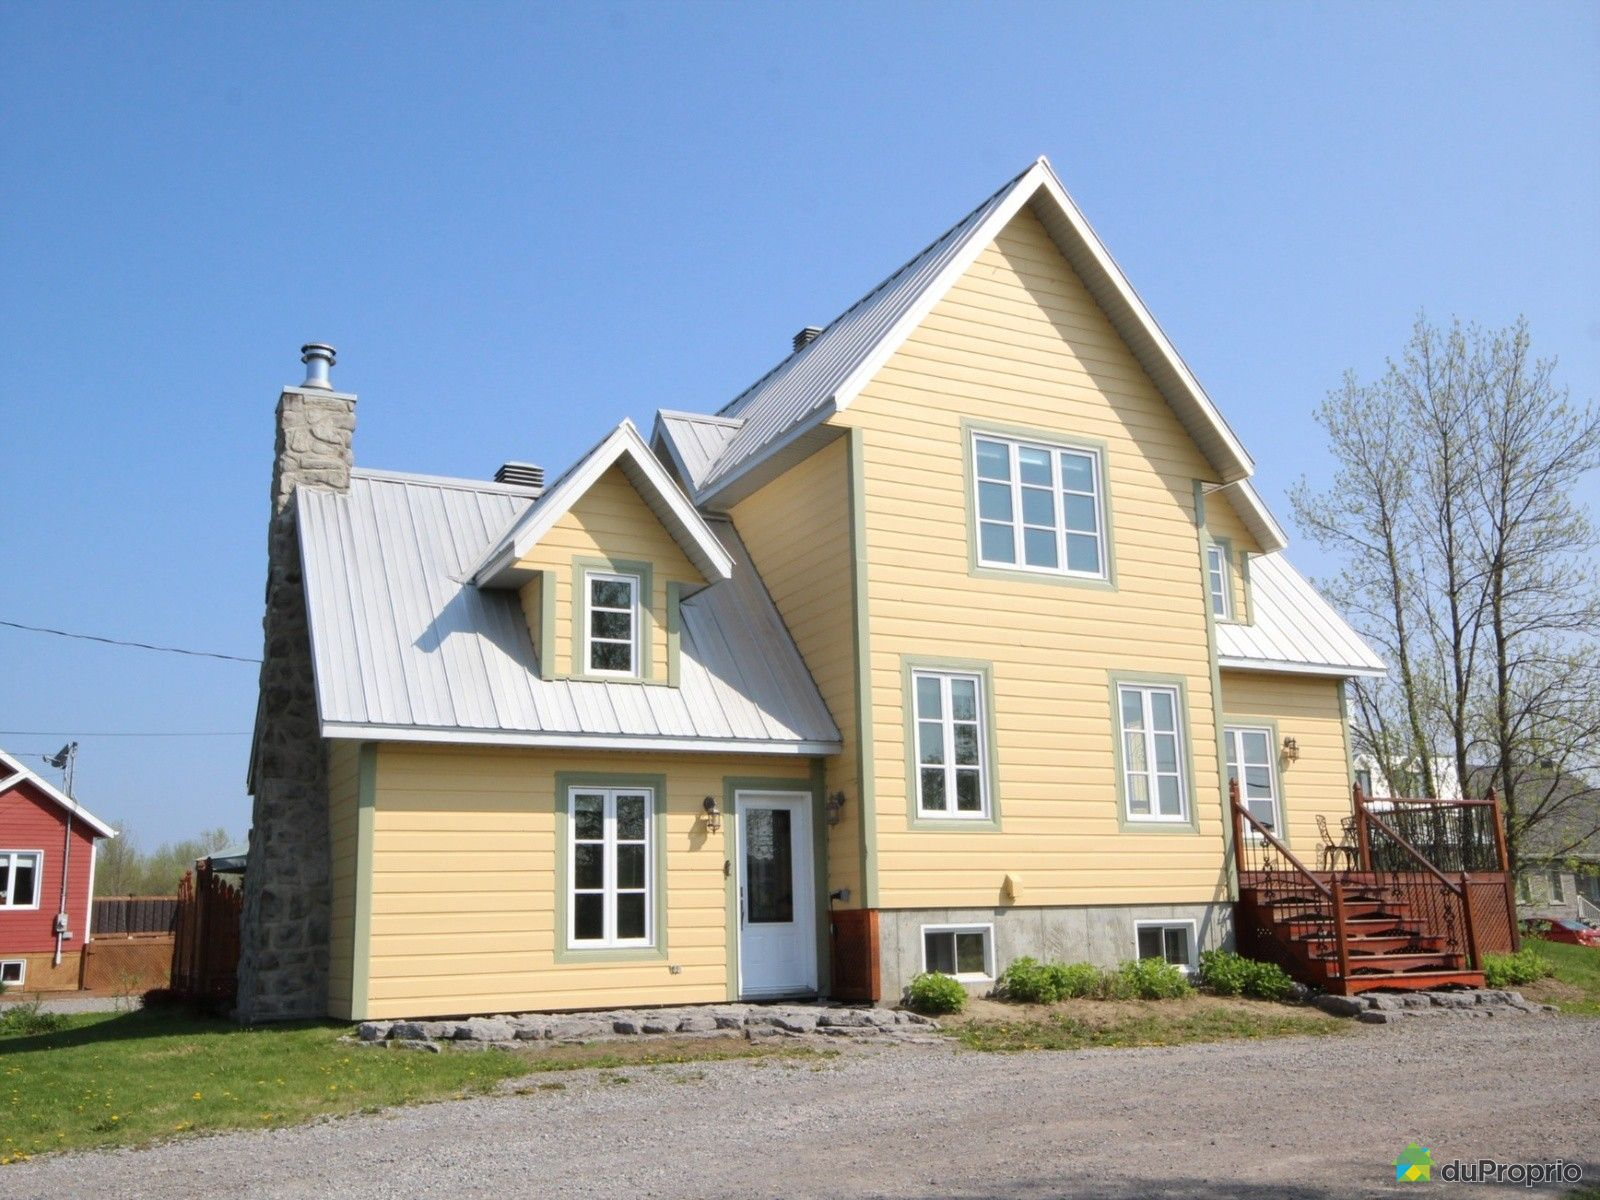 Maison vendre deschambault 184 chemin du roy for Auberge maison deschambault